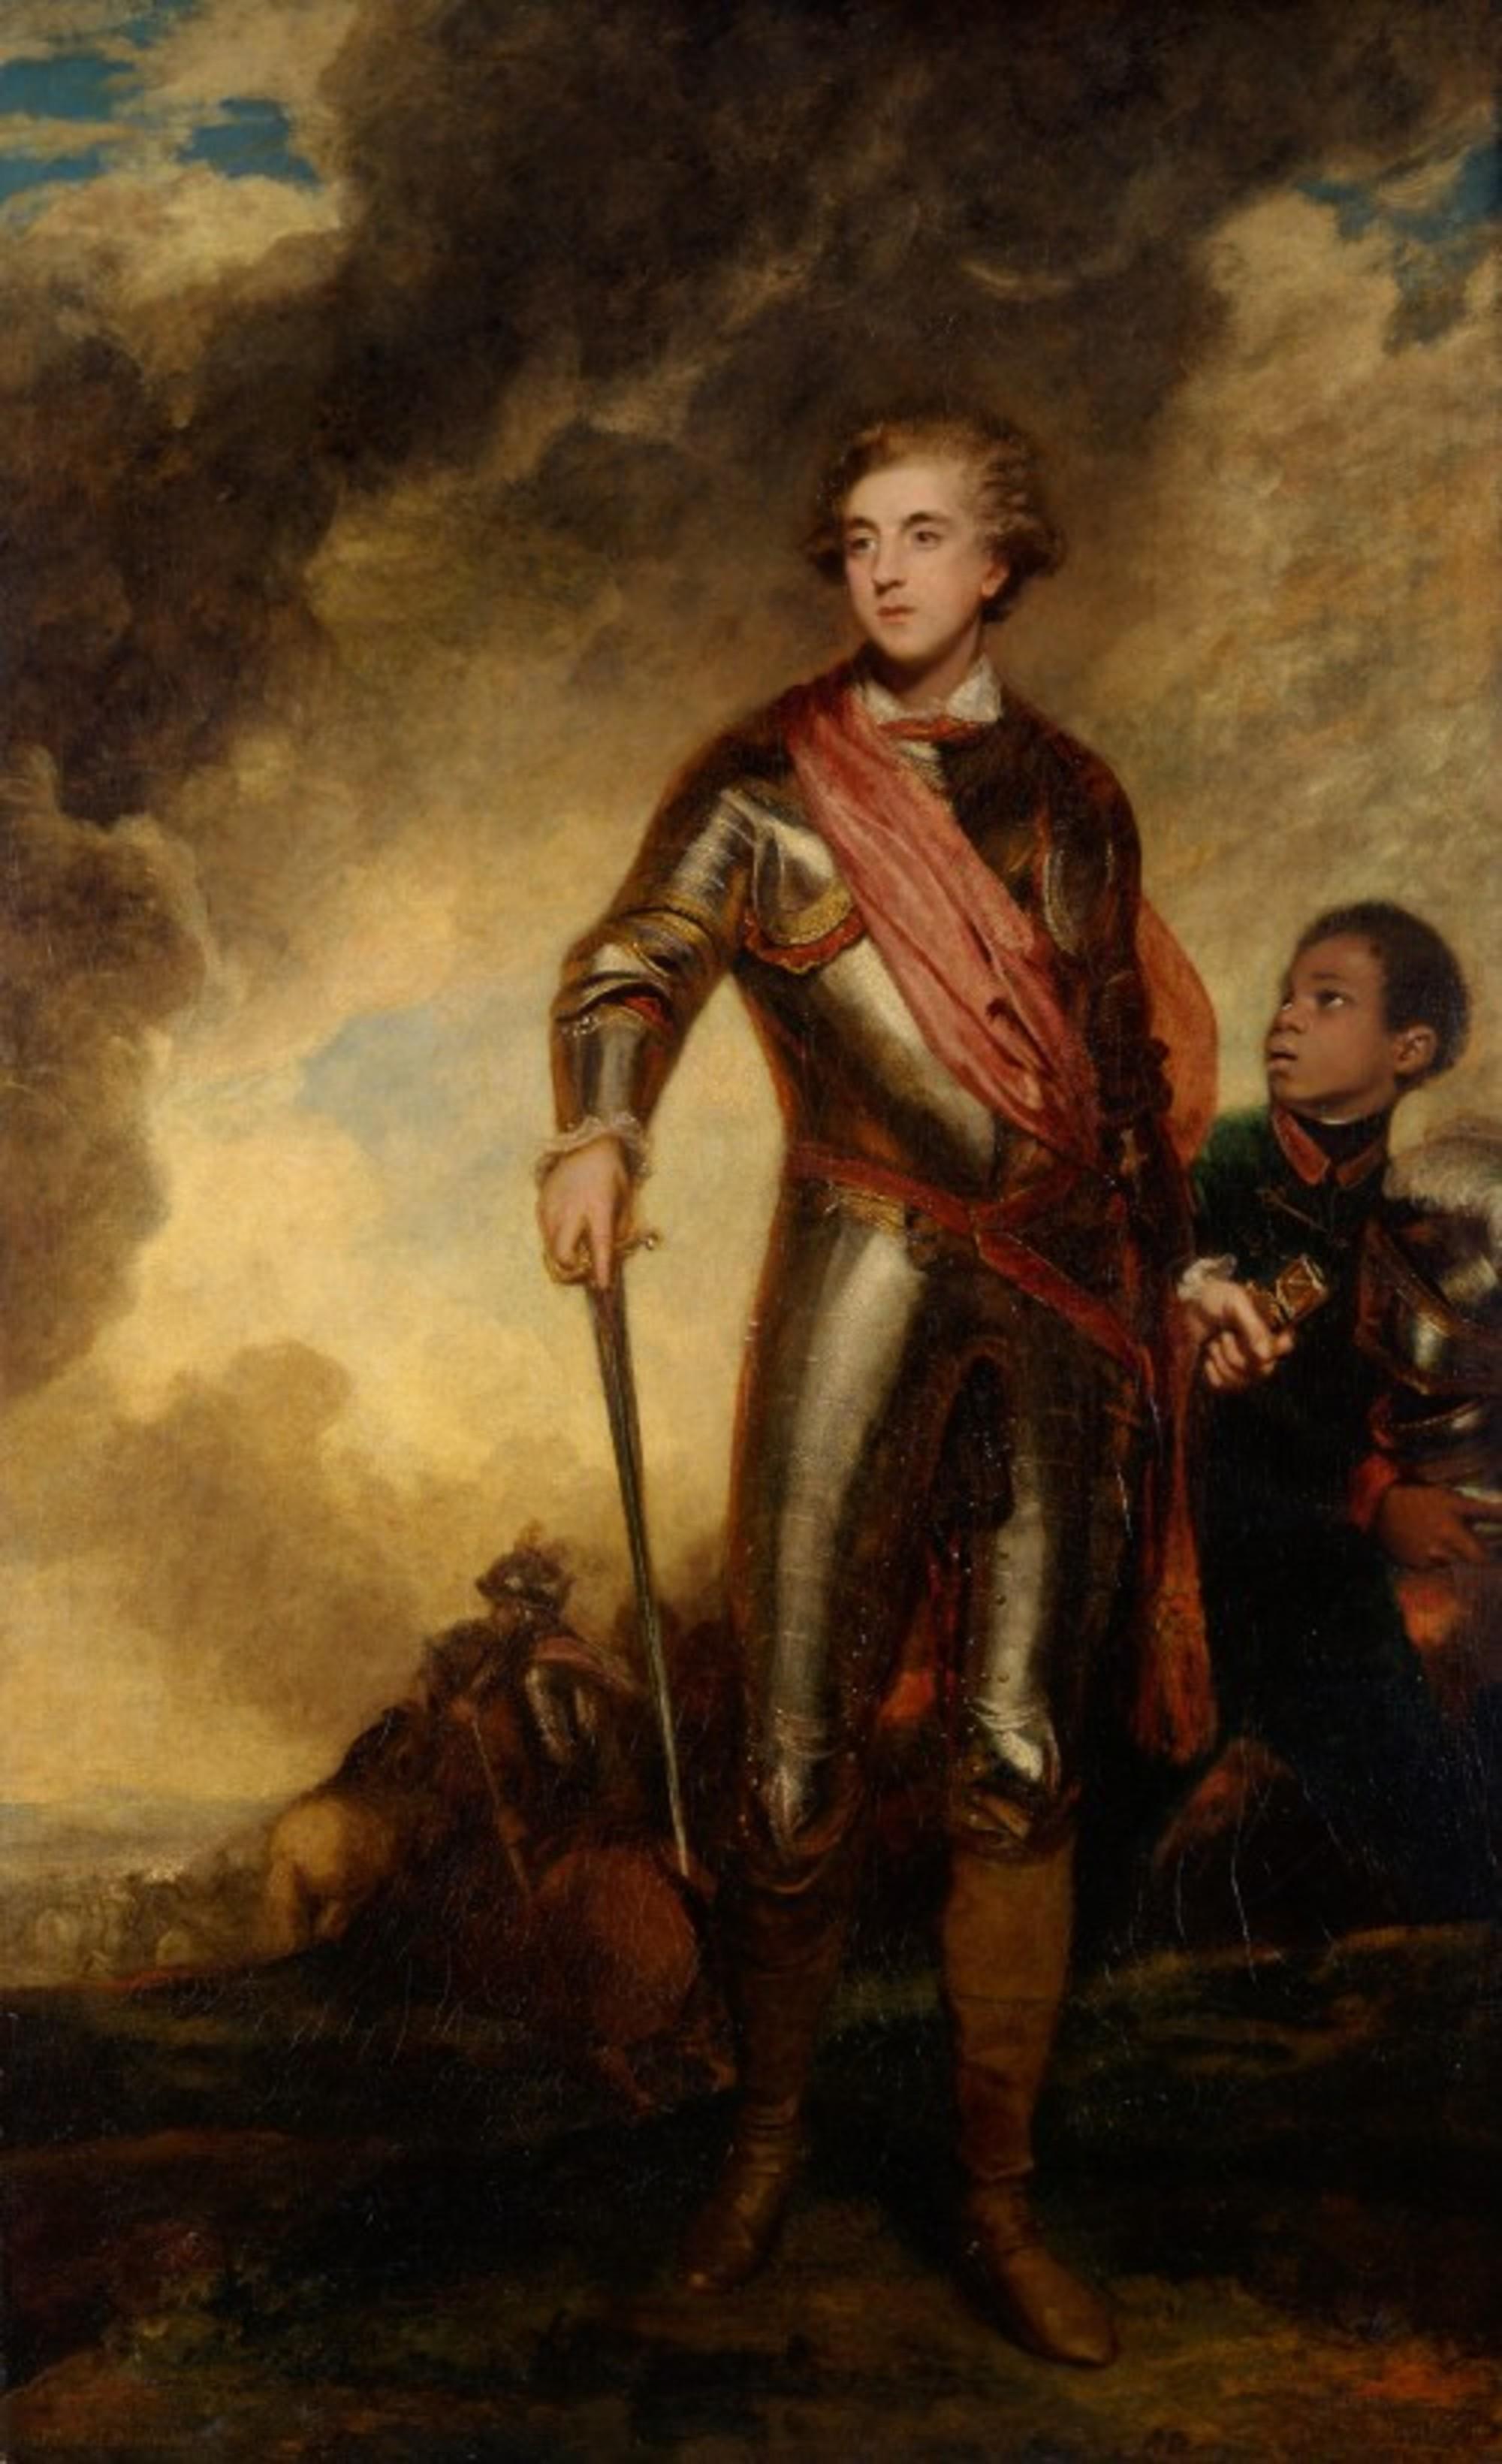 Sir_Joshua_Reynolds_-_Charles_Stanhope_3rd_Earl_of_Harrington_-_Google_Art_Project.jpg